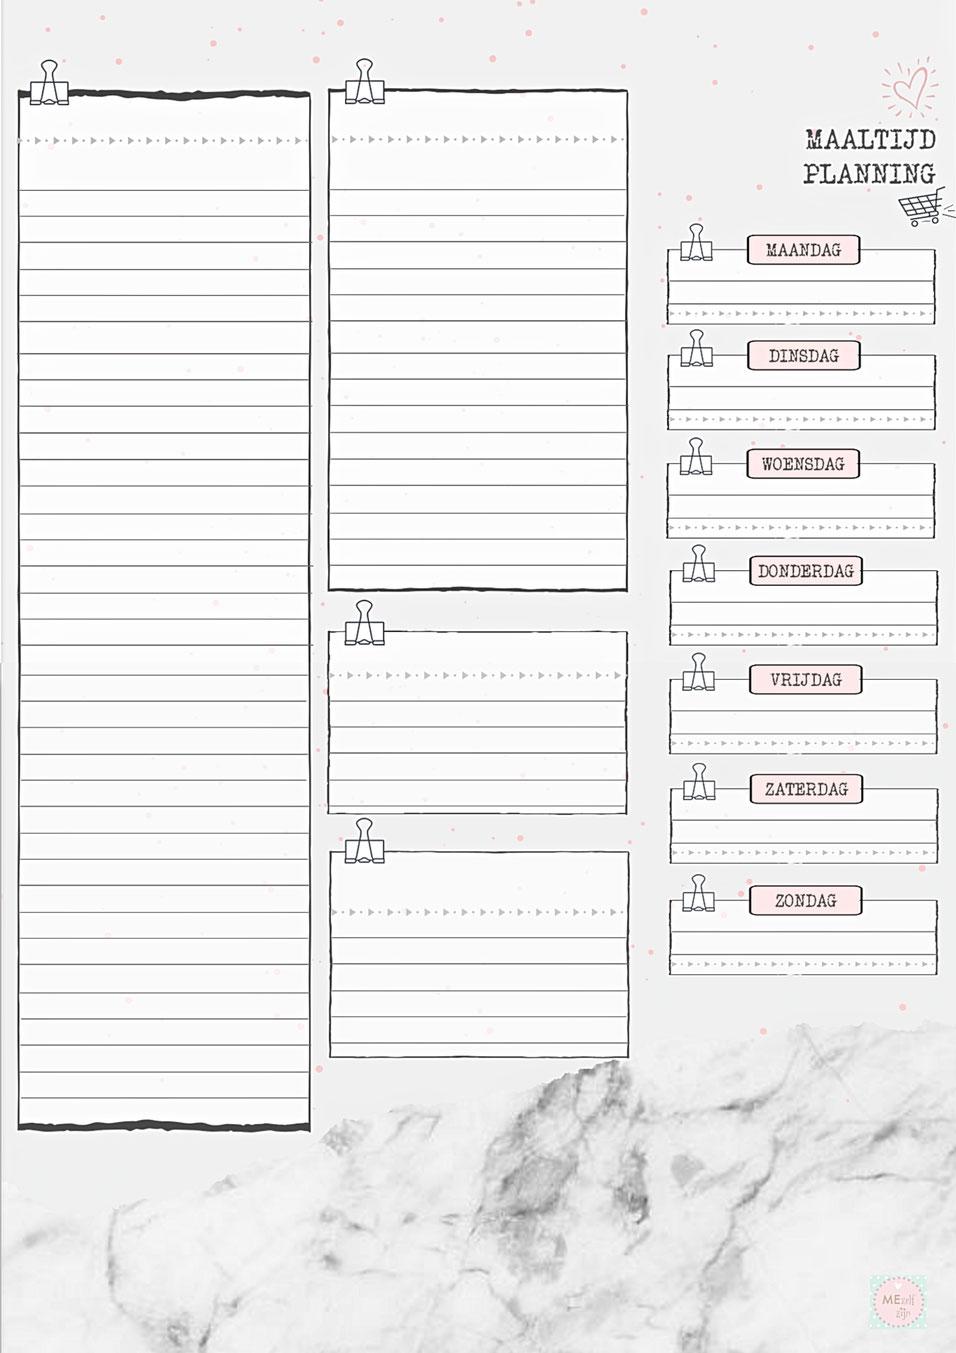 gratis stencil menu plan - free template menu plan - weekmenu gratis stencil - weekmenu printable , free printable meal planning - free template budget planner nederlands - free template nederlands - free printable nederlands